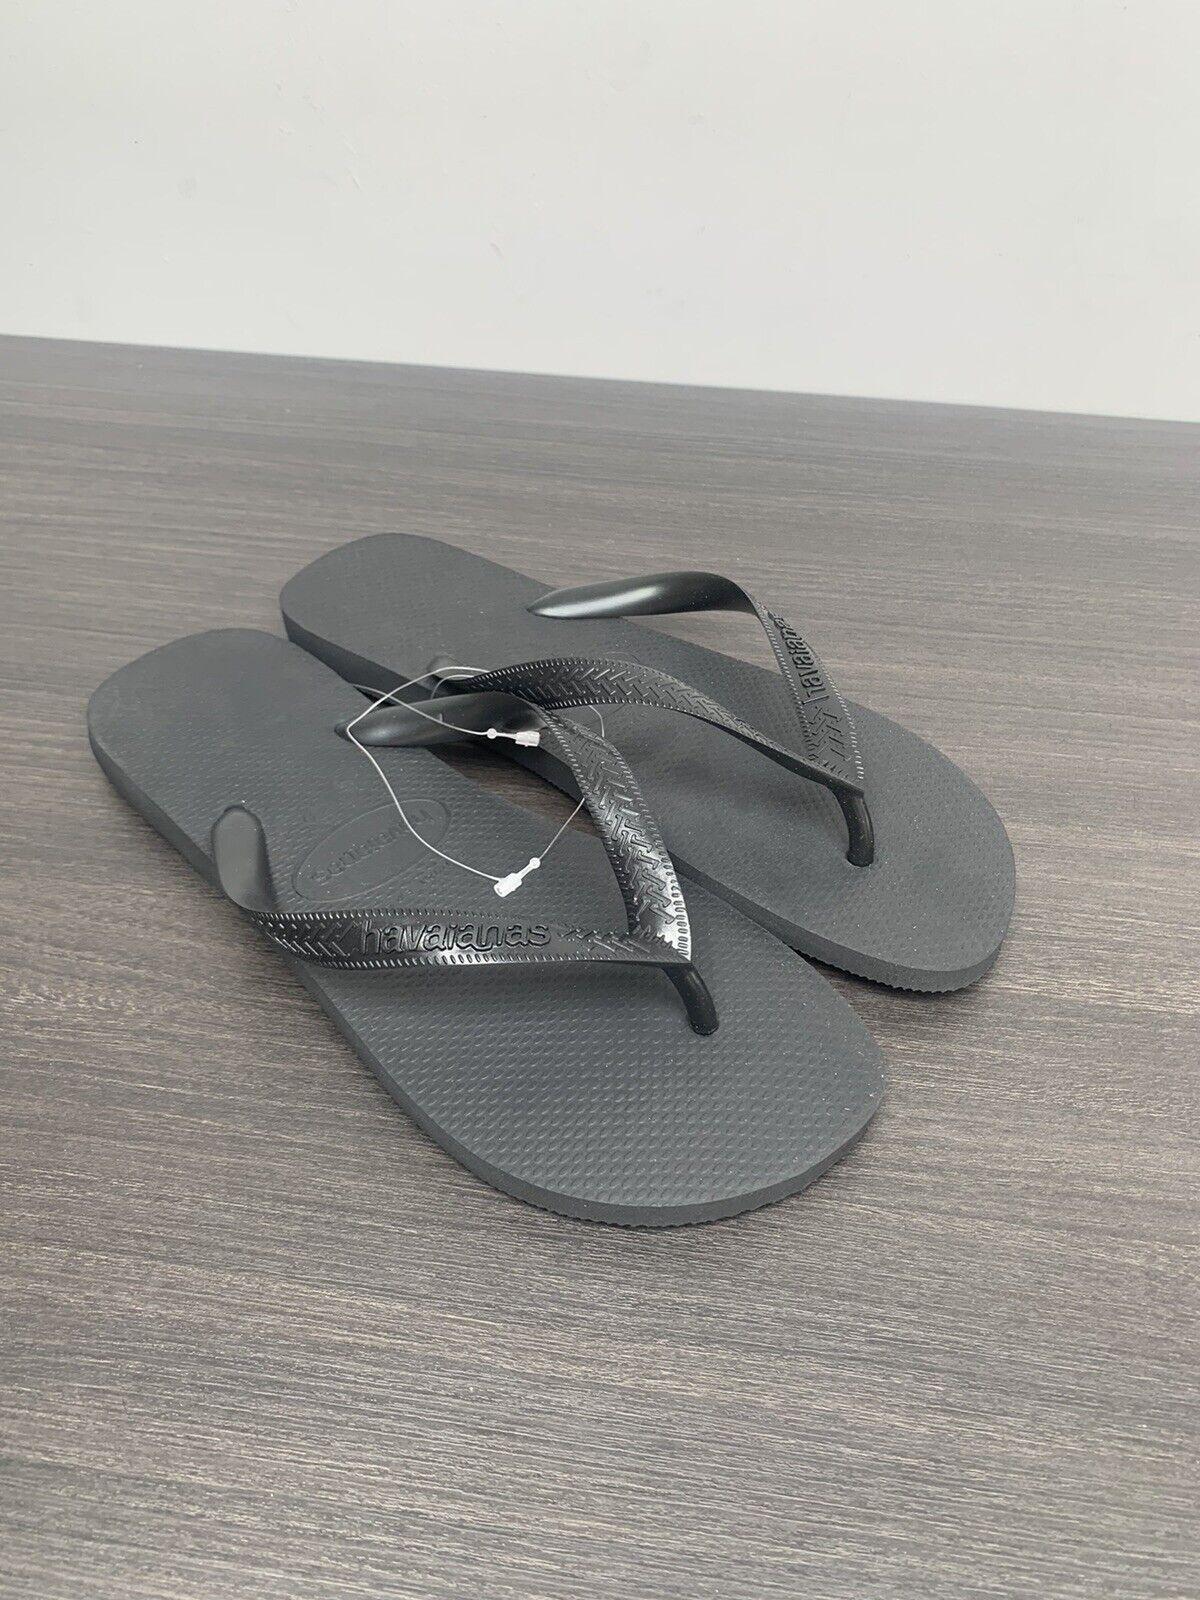 Havaianas Men's All Black Flip-Flops EU 45/46 BRAND NEW